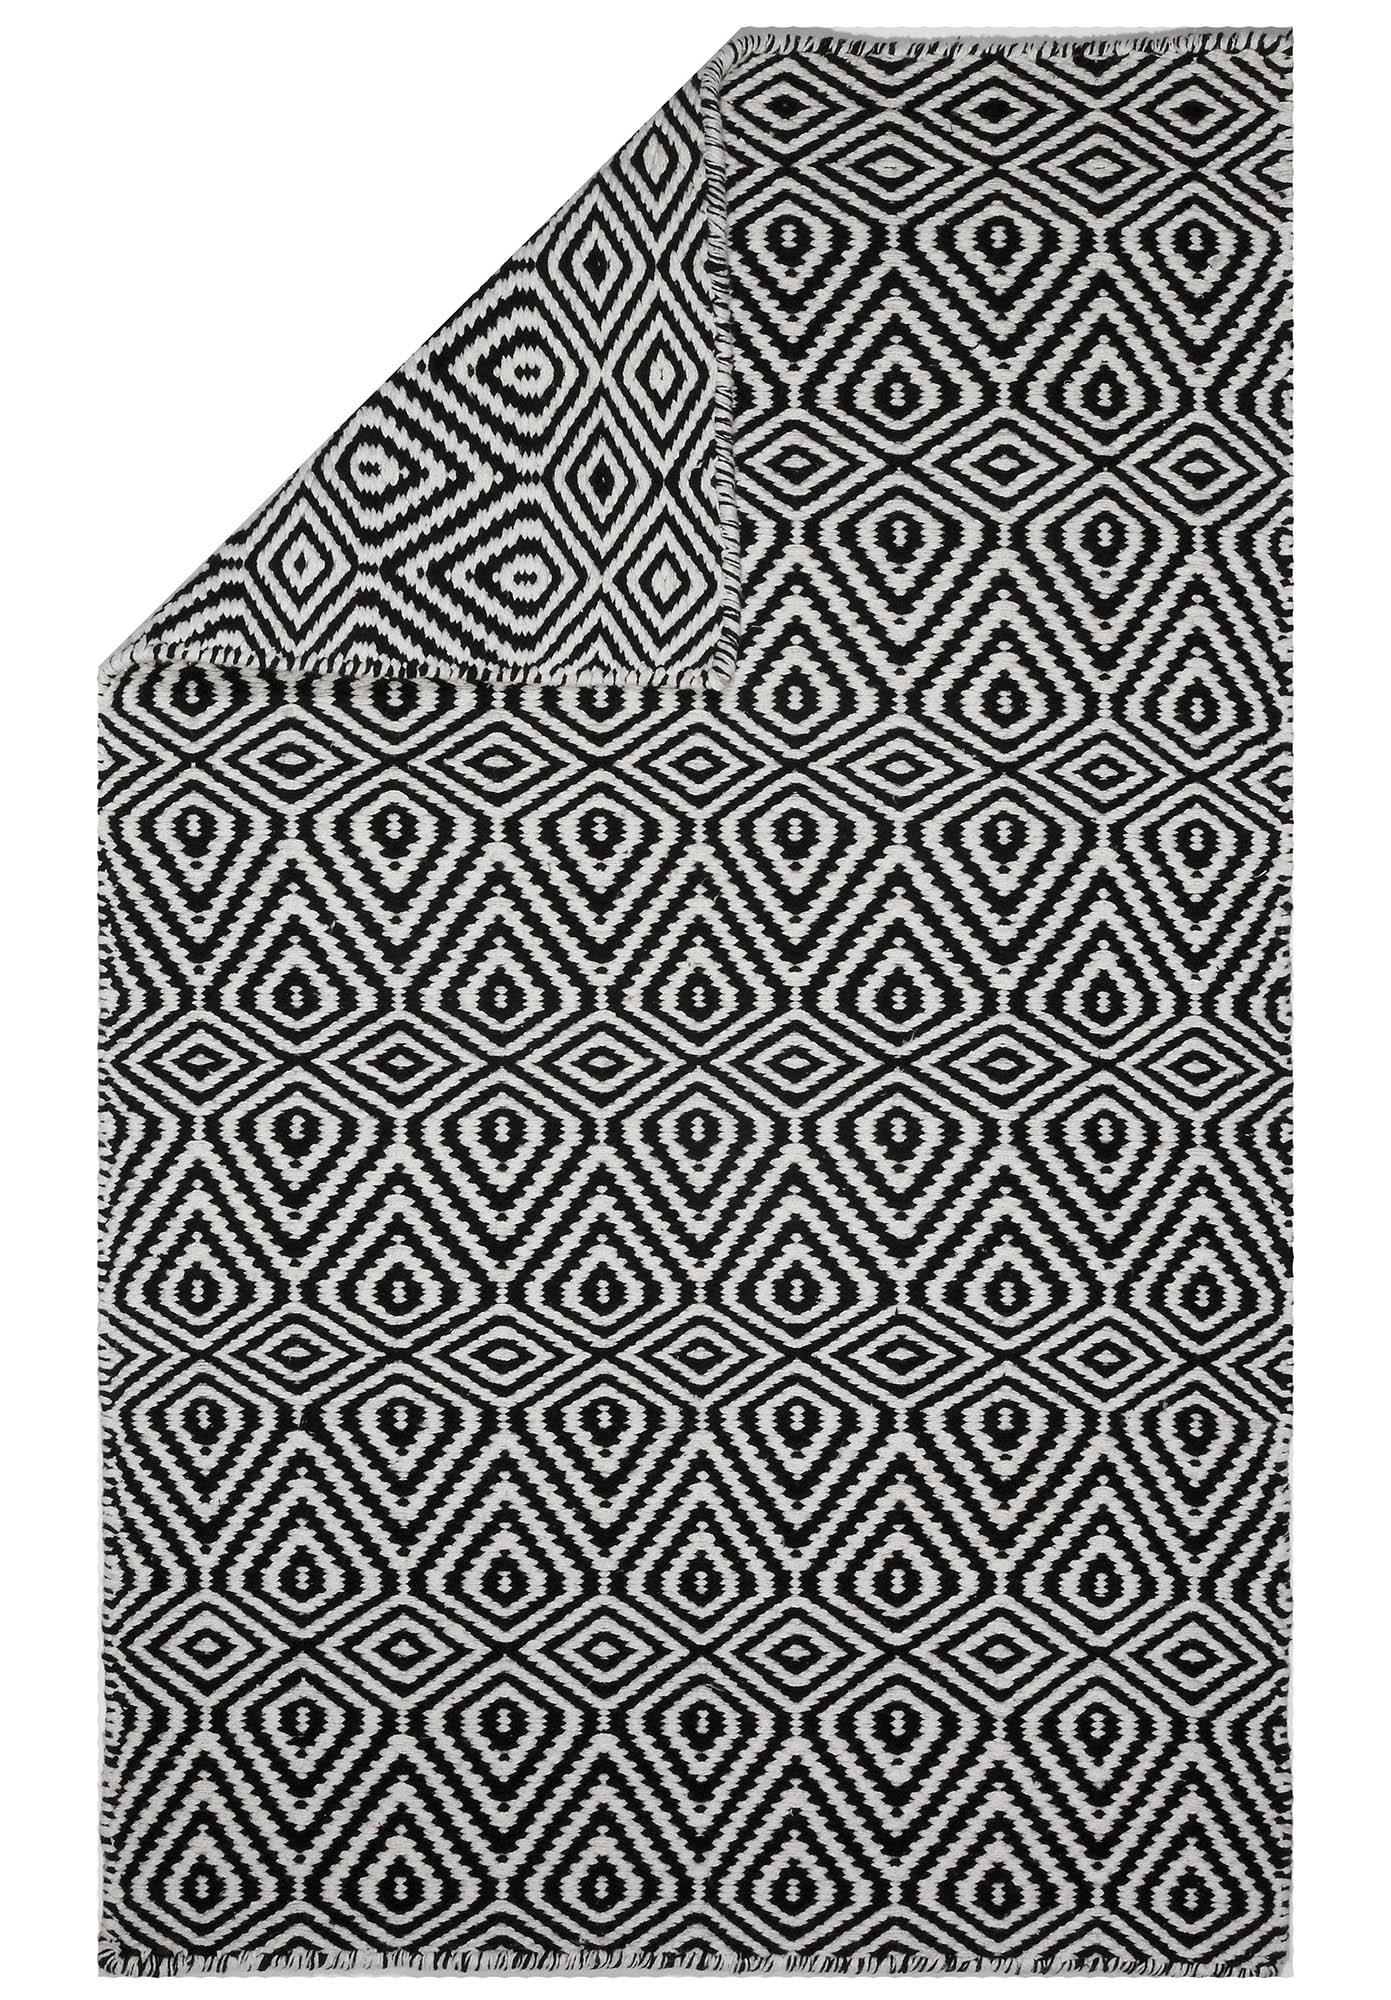 ellis black geometric orren witherell white grey blackgreywhite triangle rugs mosaic rug pdp area